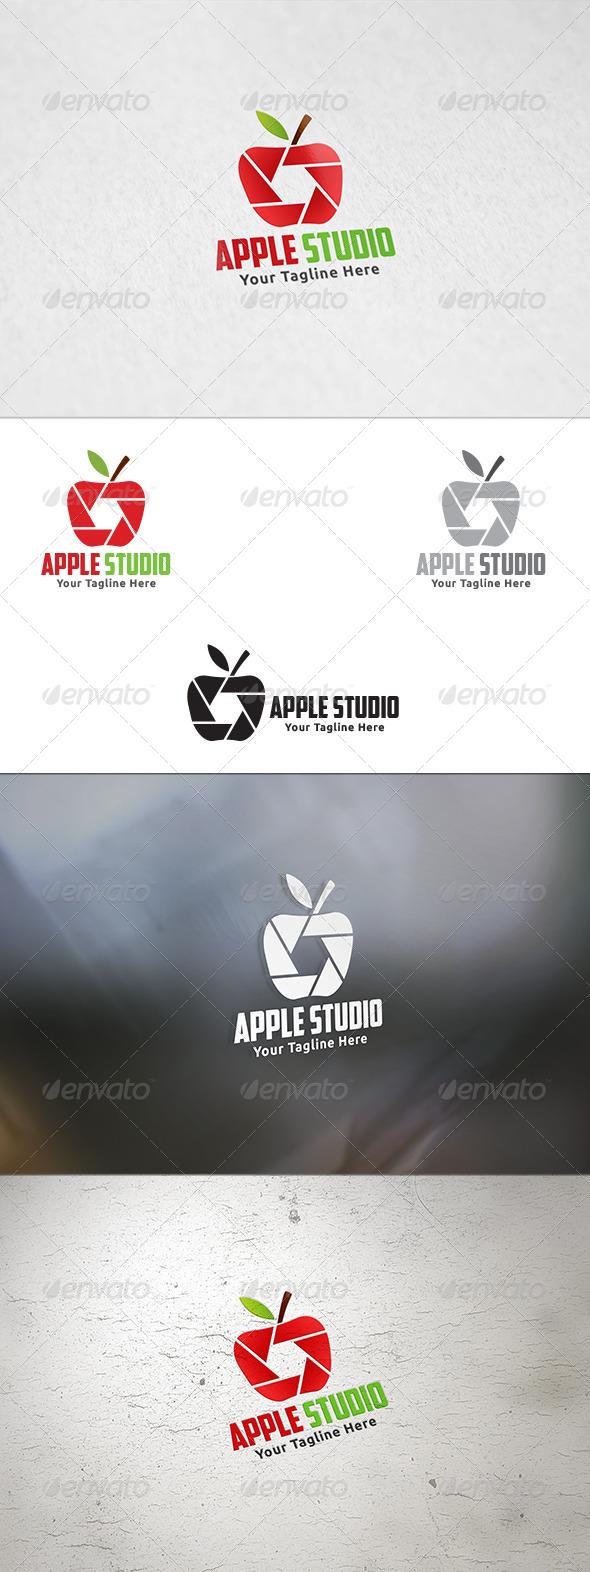 Apple Studio - Logo Template